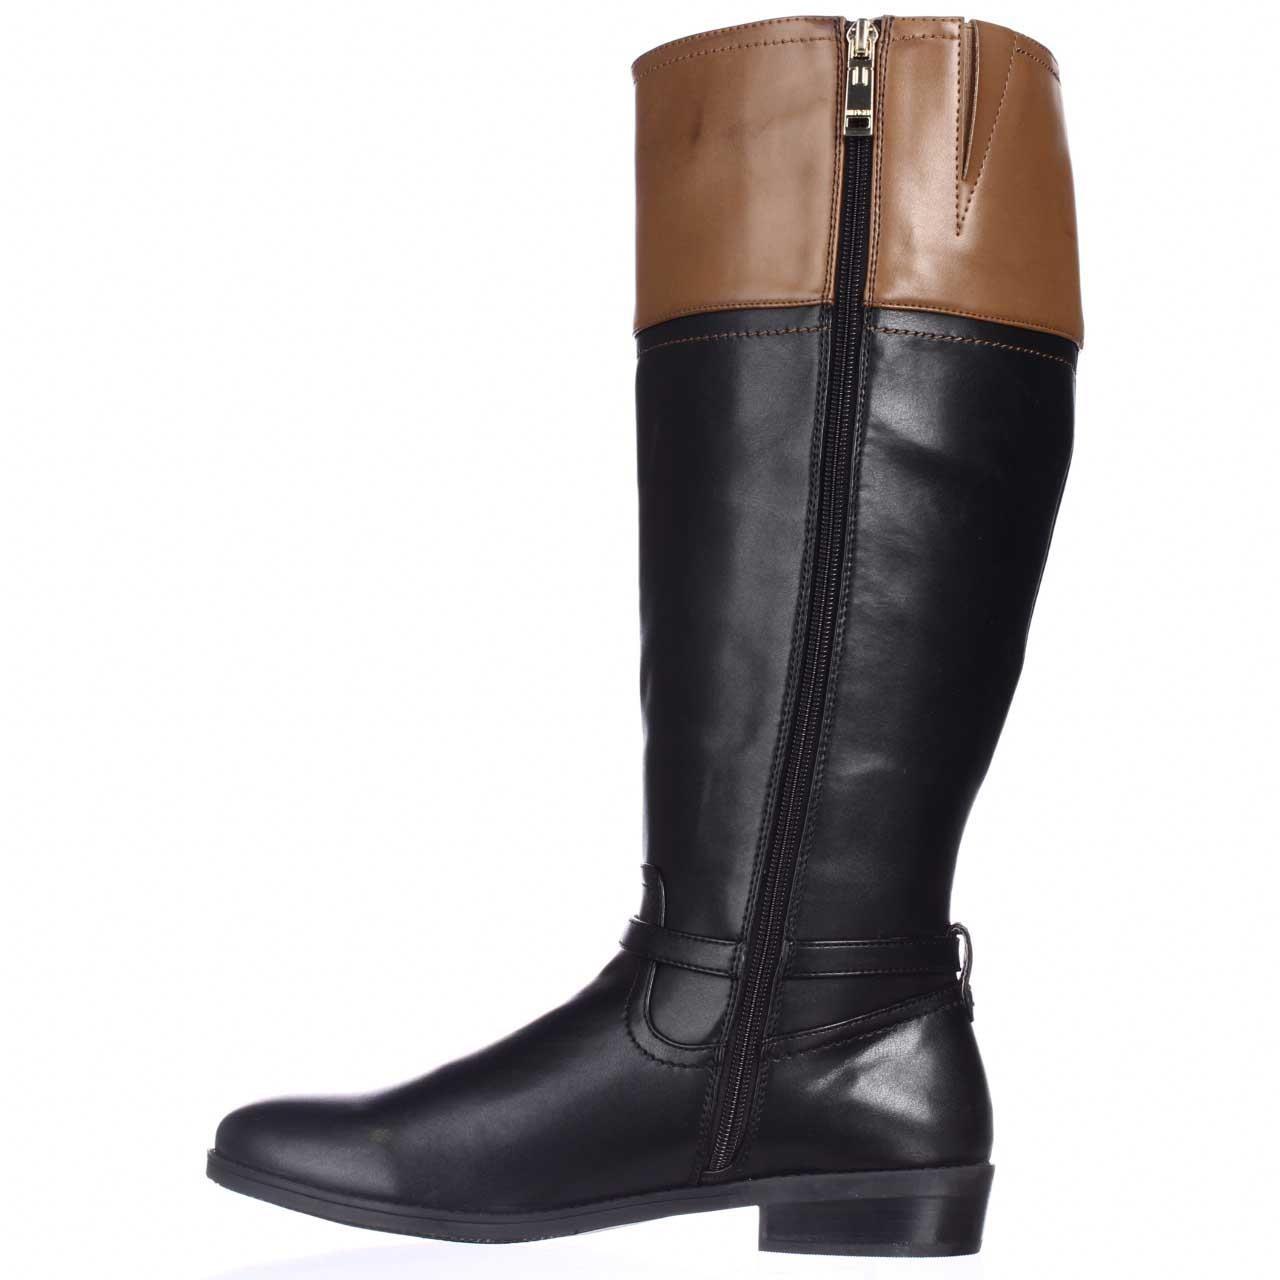 tommy hilfiger drea2 wide calf knee high riding boots in black lyst. Black Bedroom Furniture Sets. Home Design Ideas